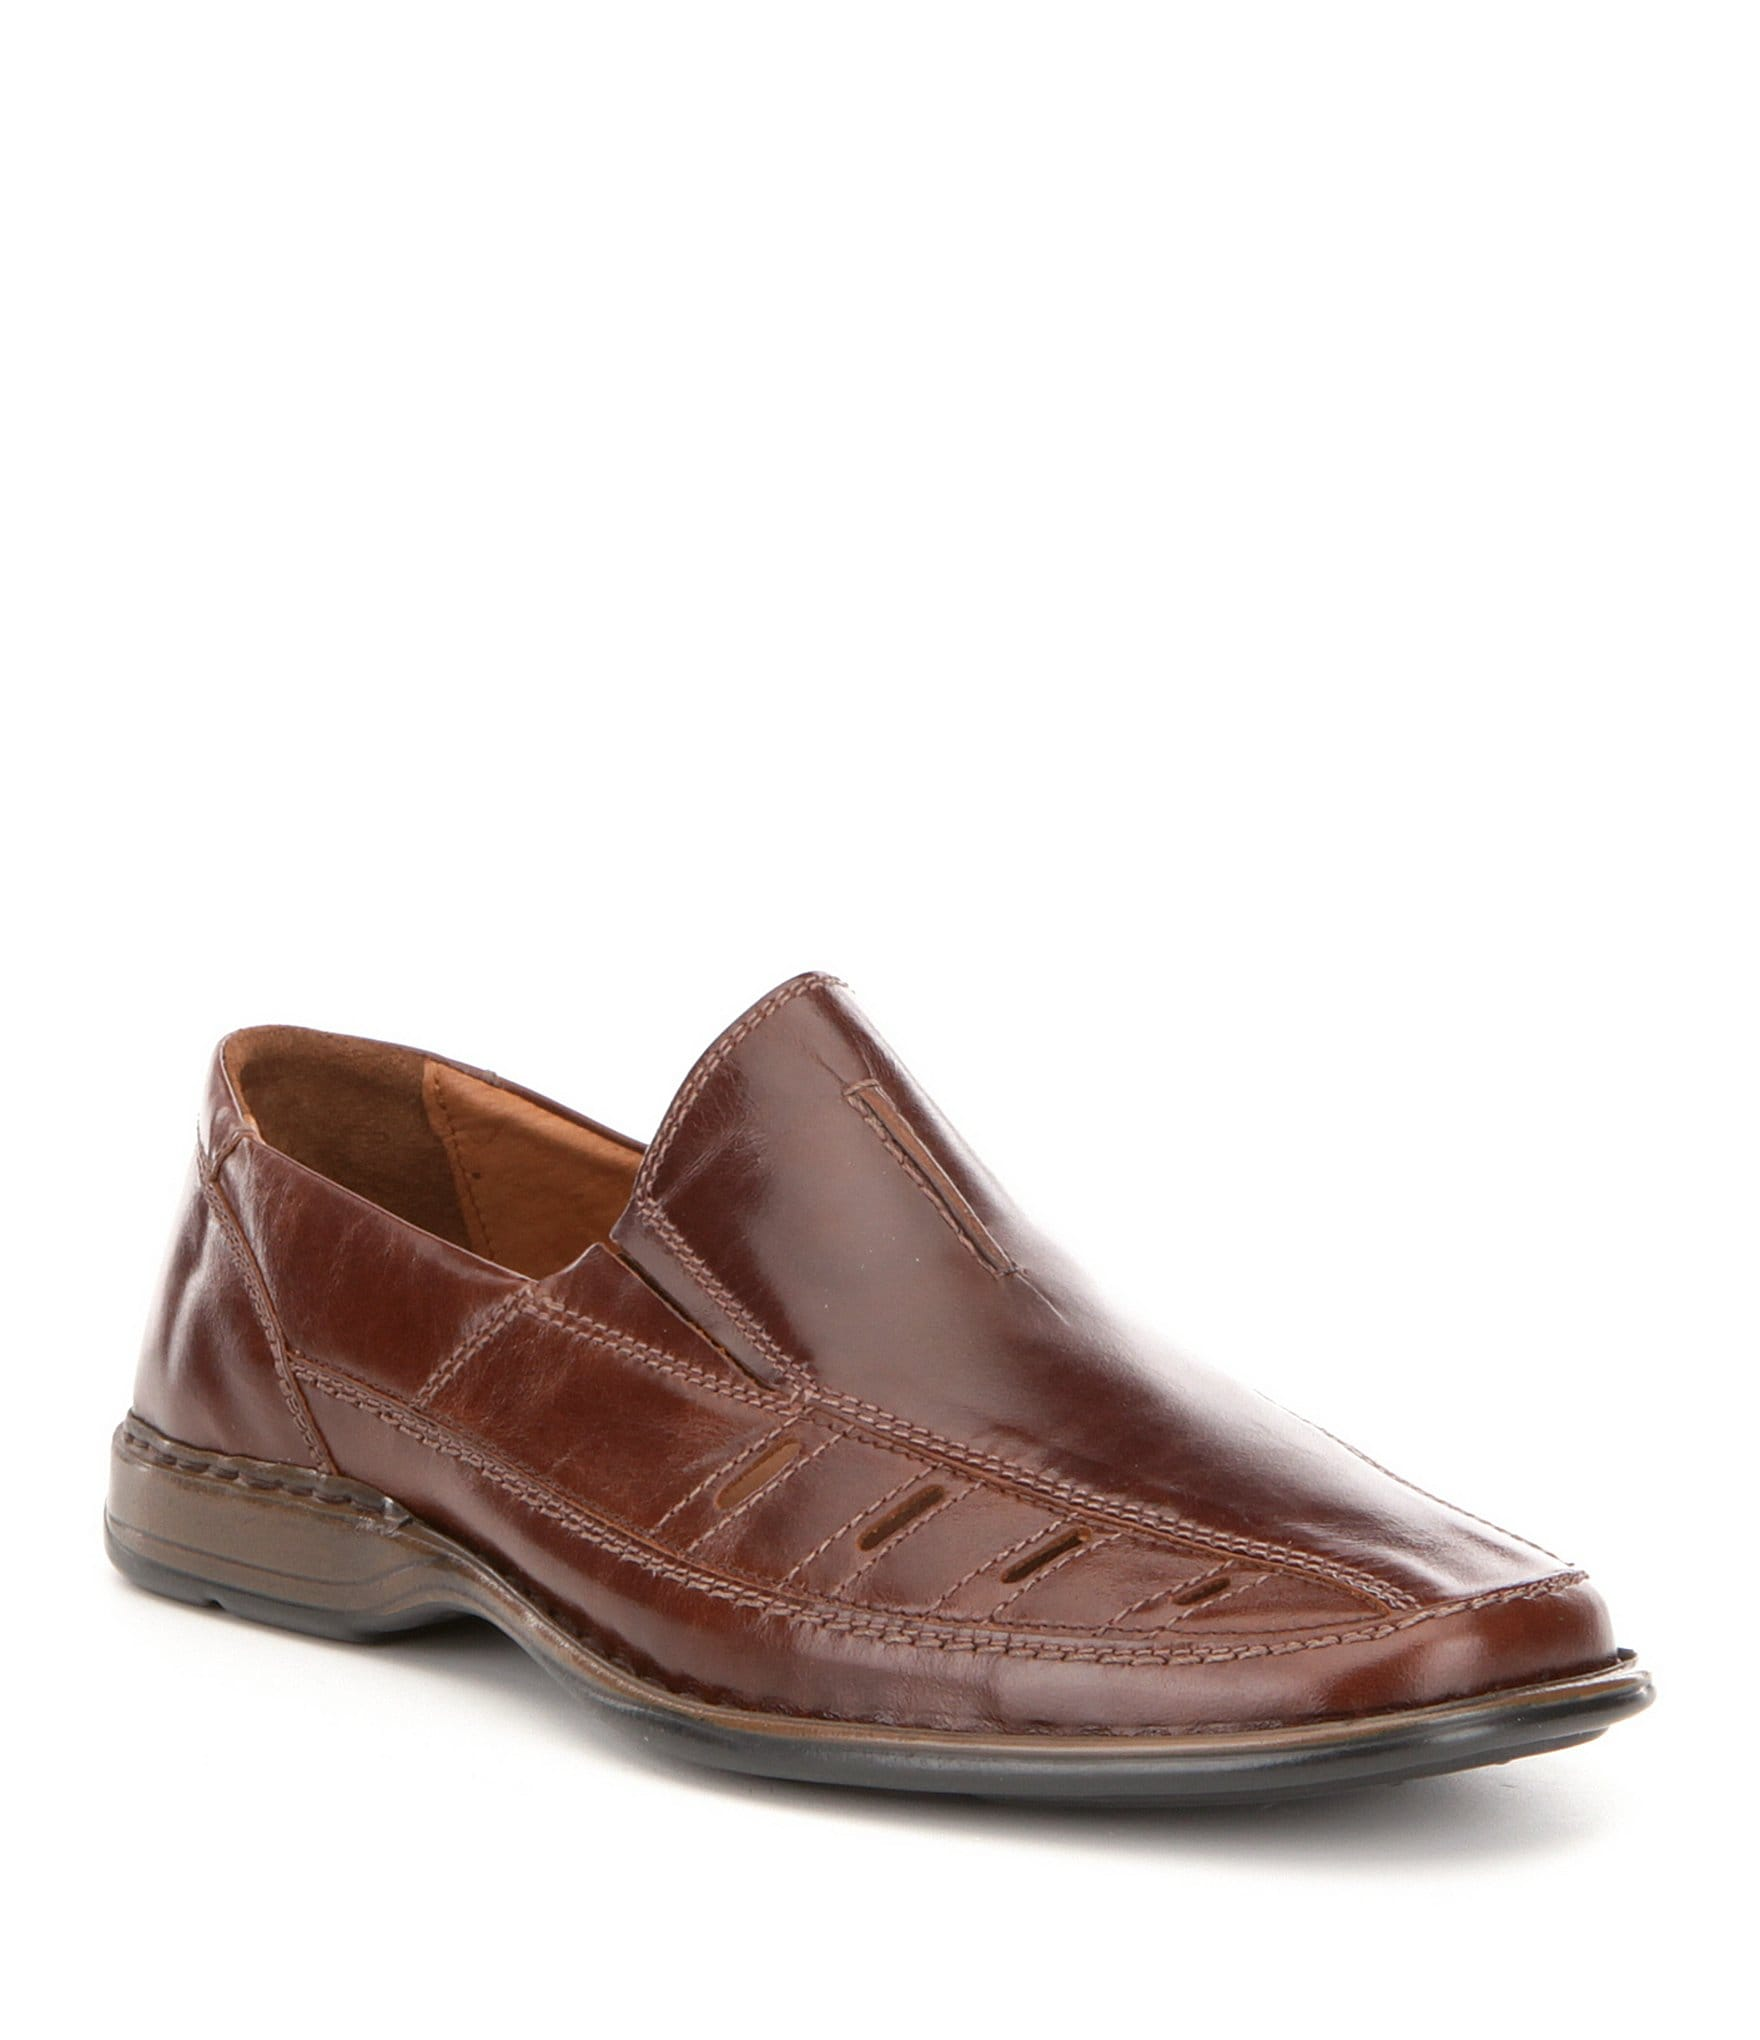 Josef Seibel Shoes True To Size